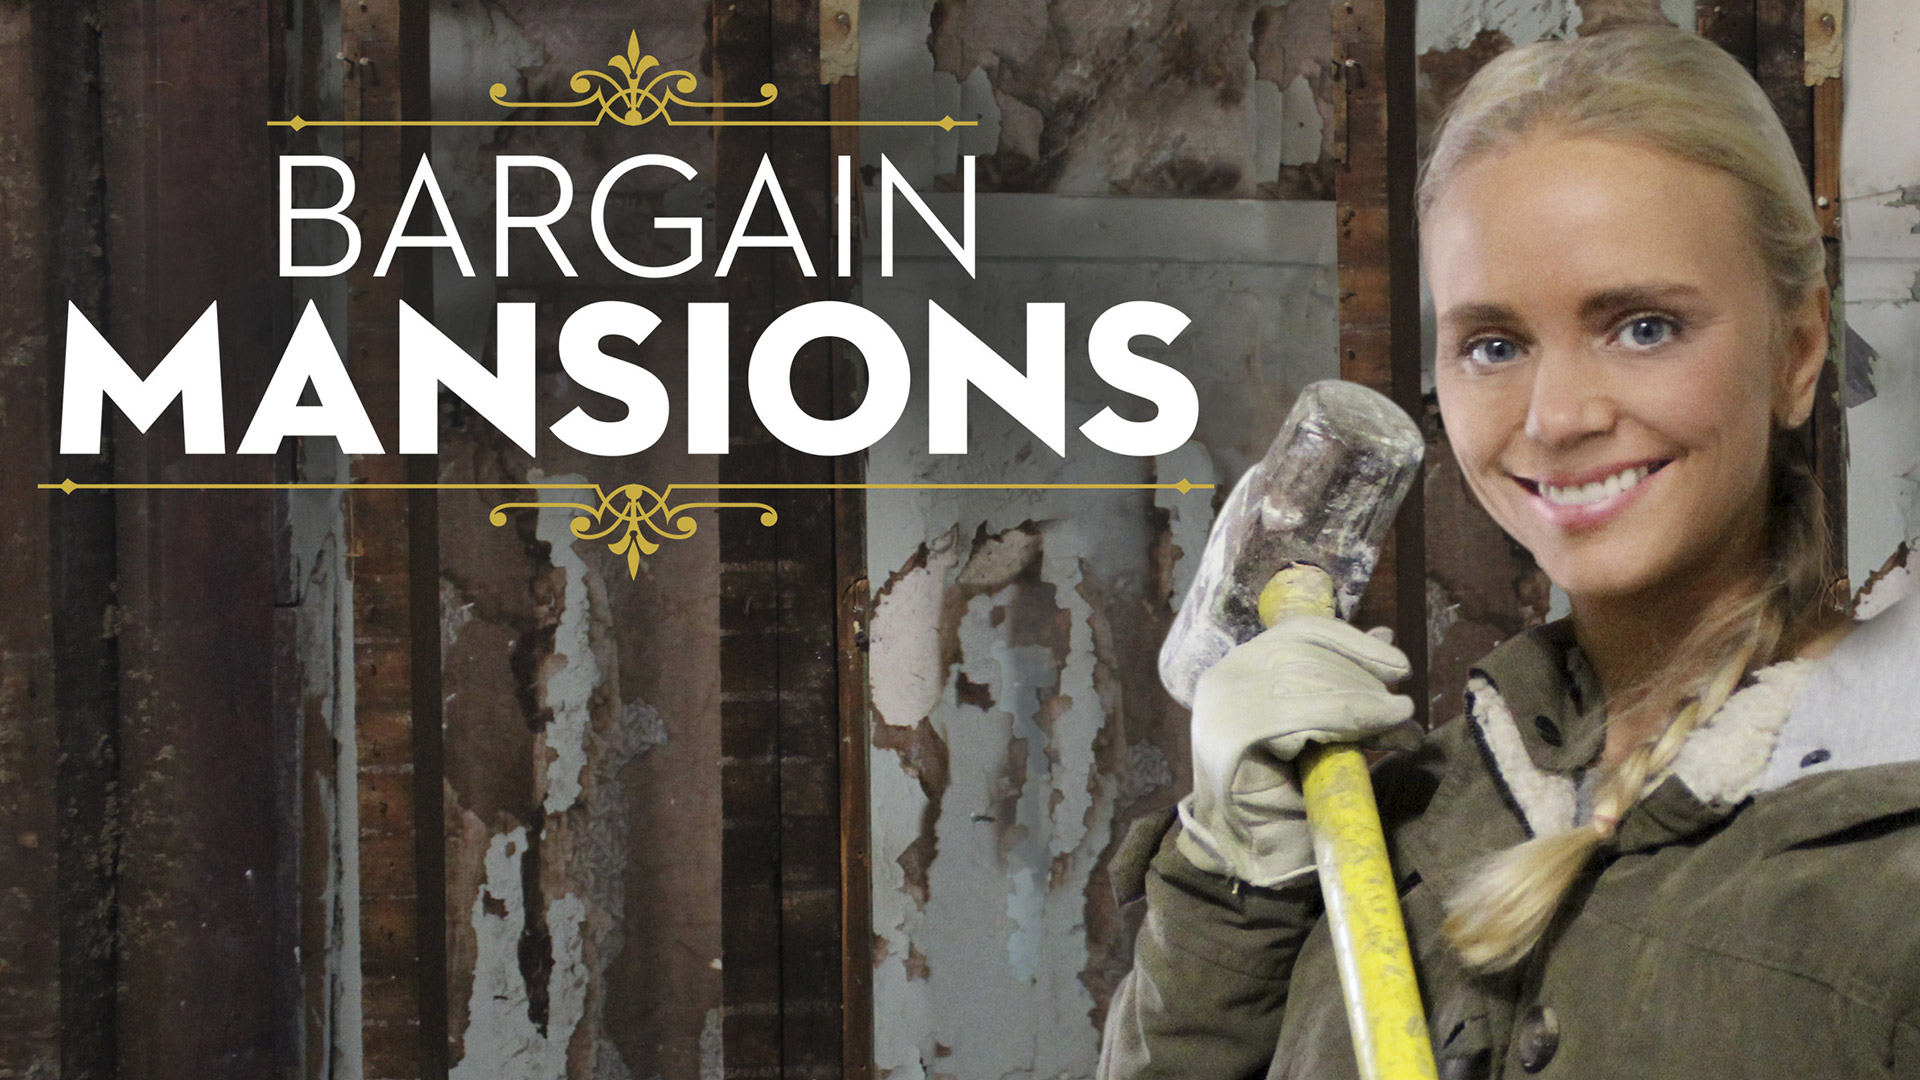 Bargain Mansions, Season 1